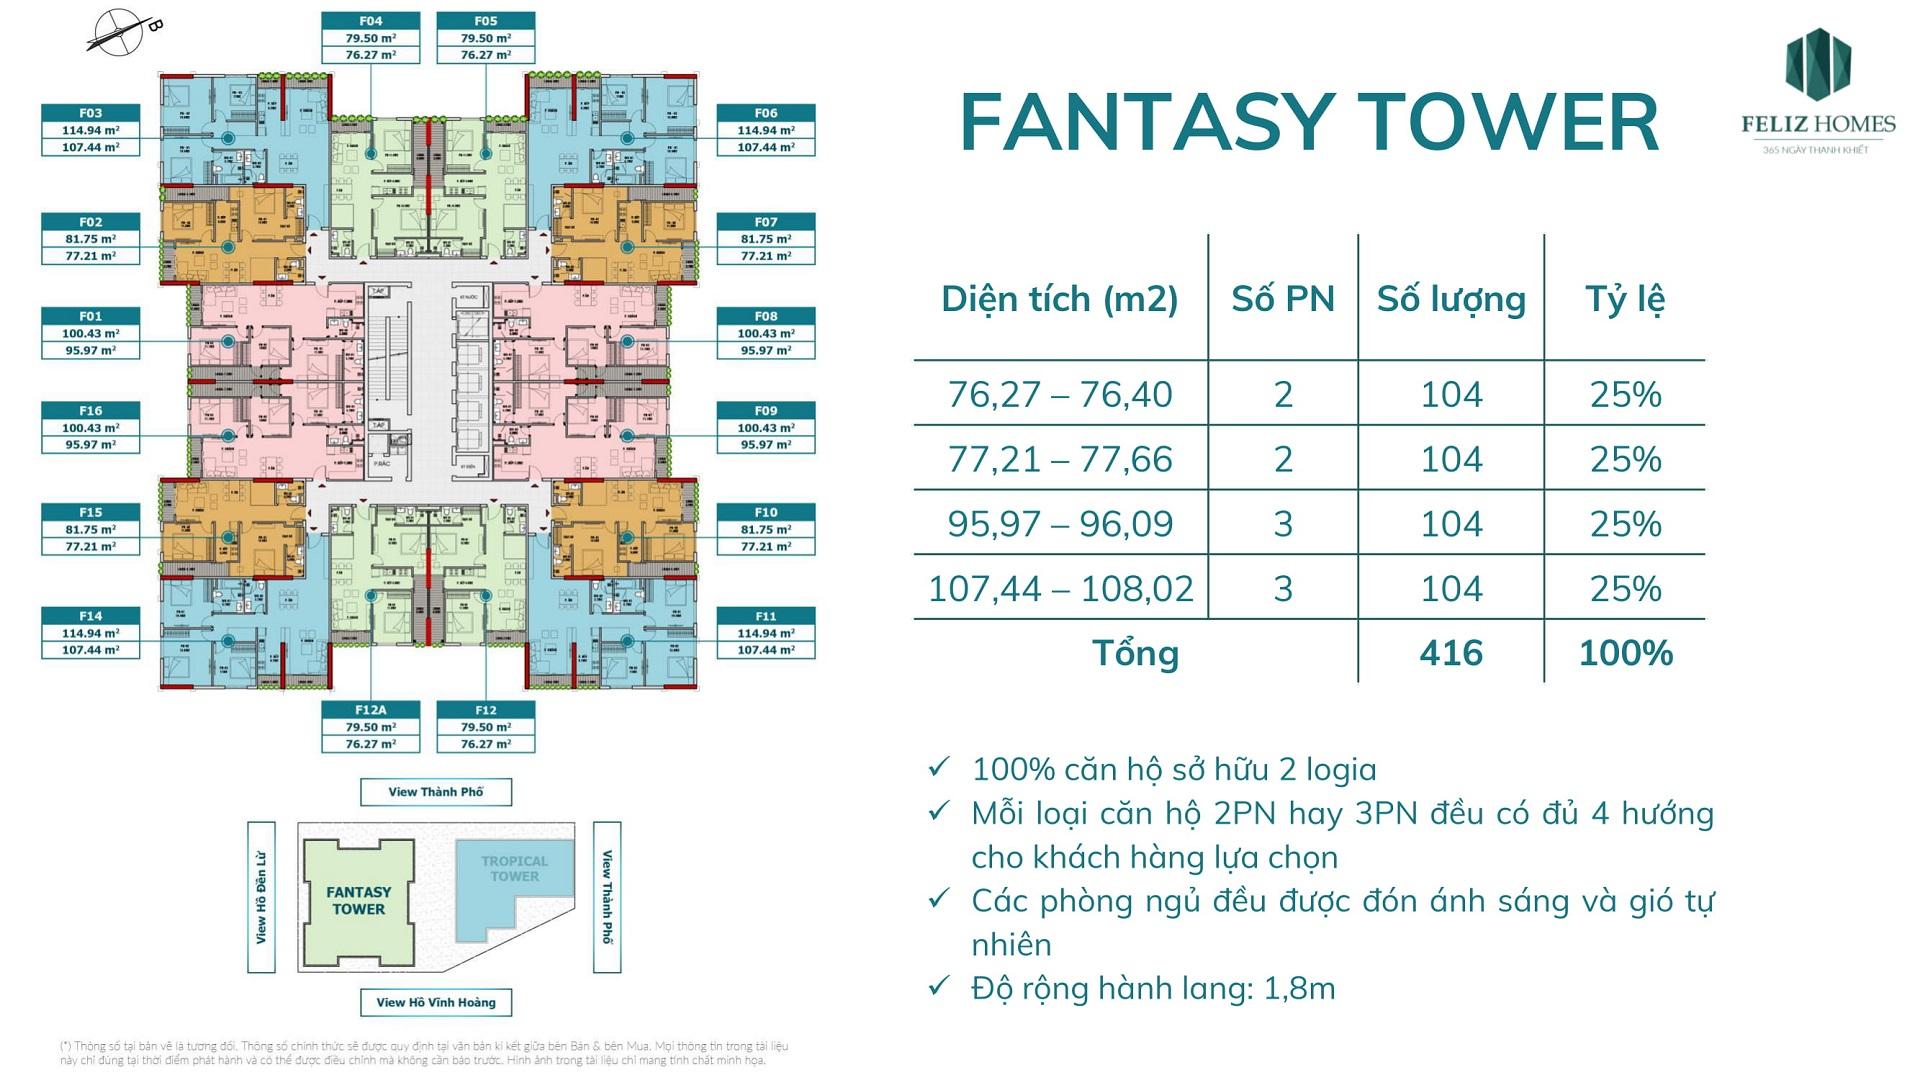 tòa fantasy tower dự án feliz homes